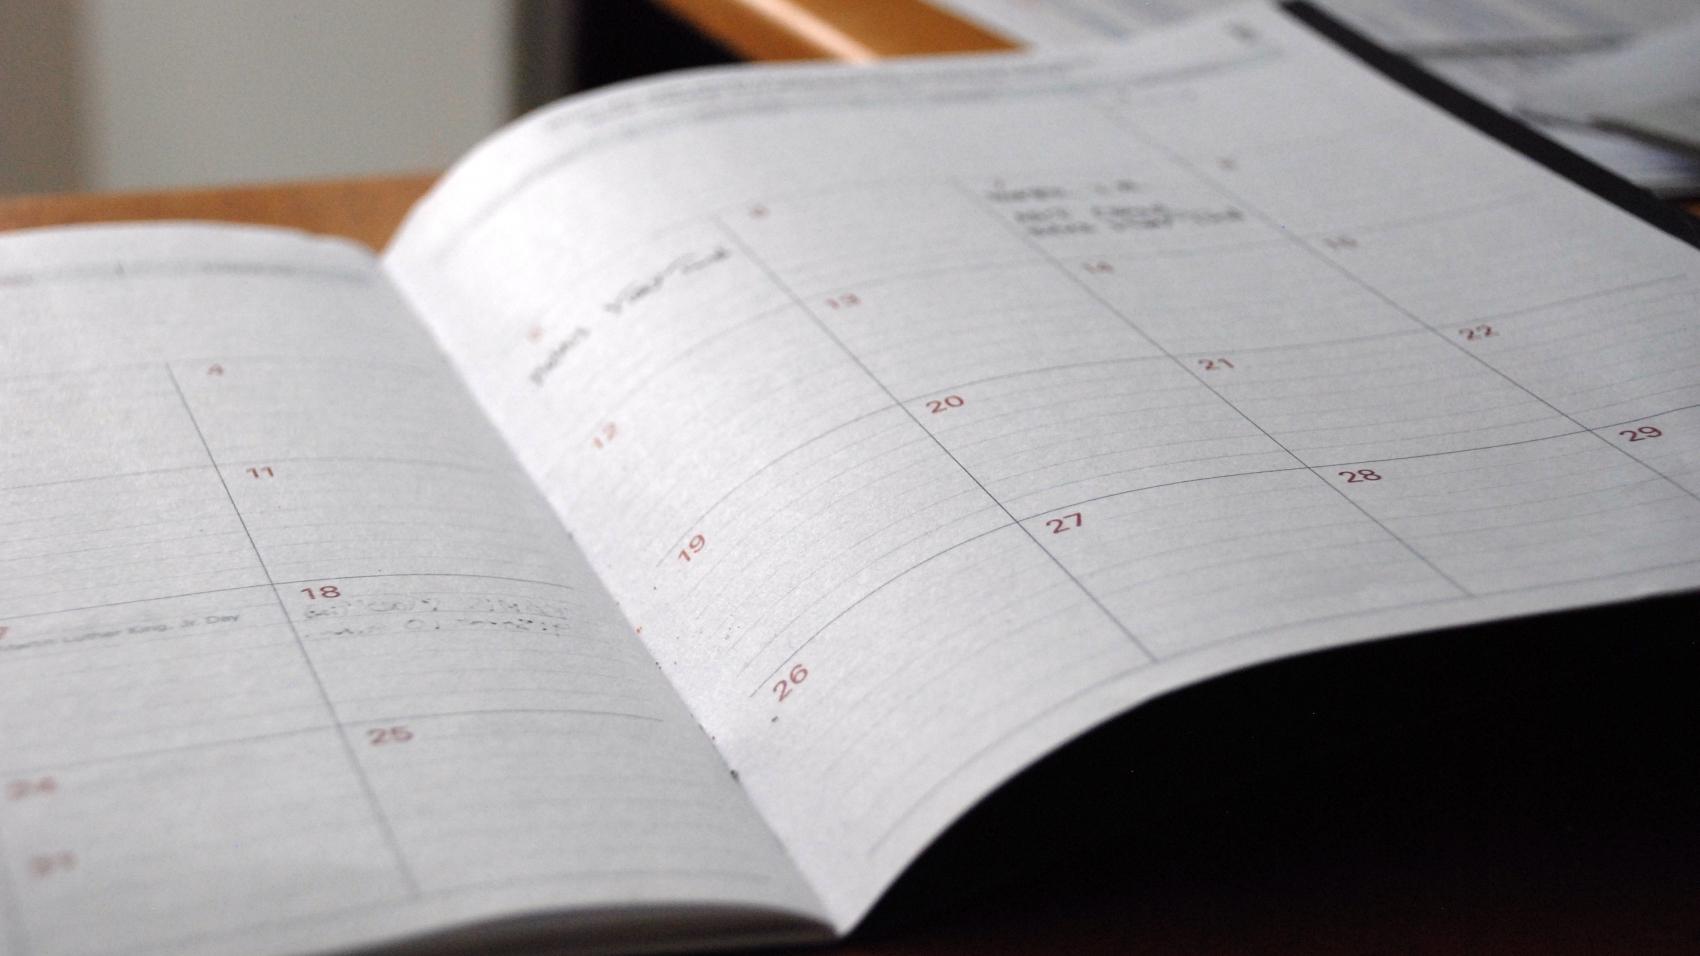 image following the calendar organization tips